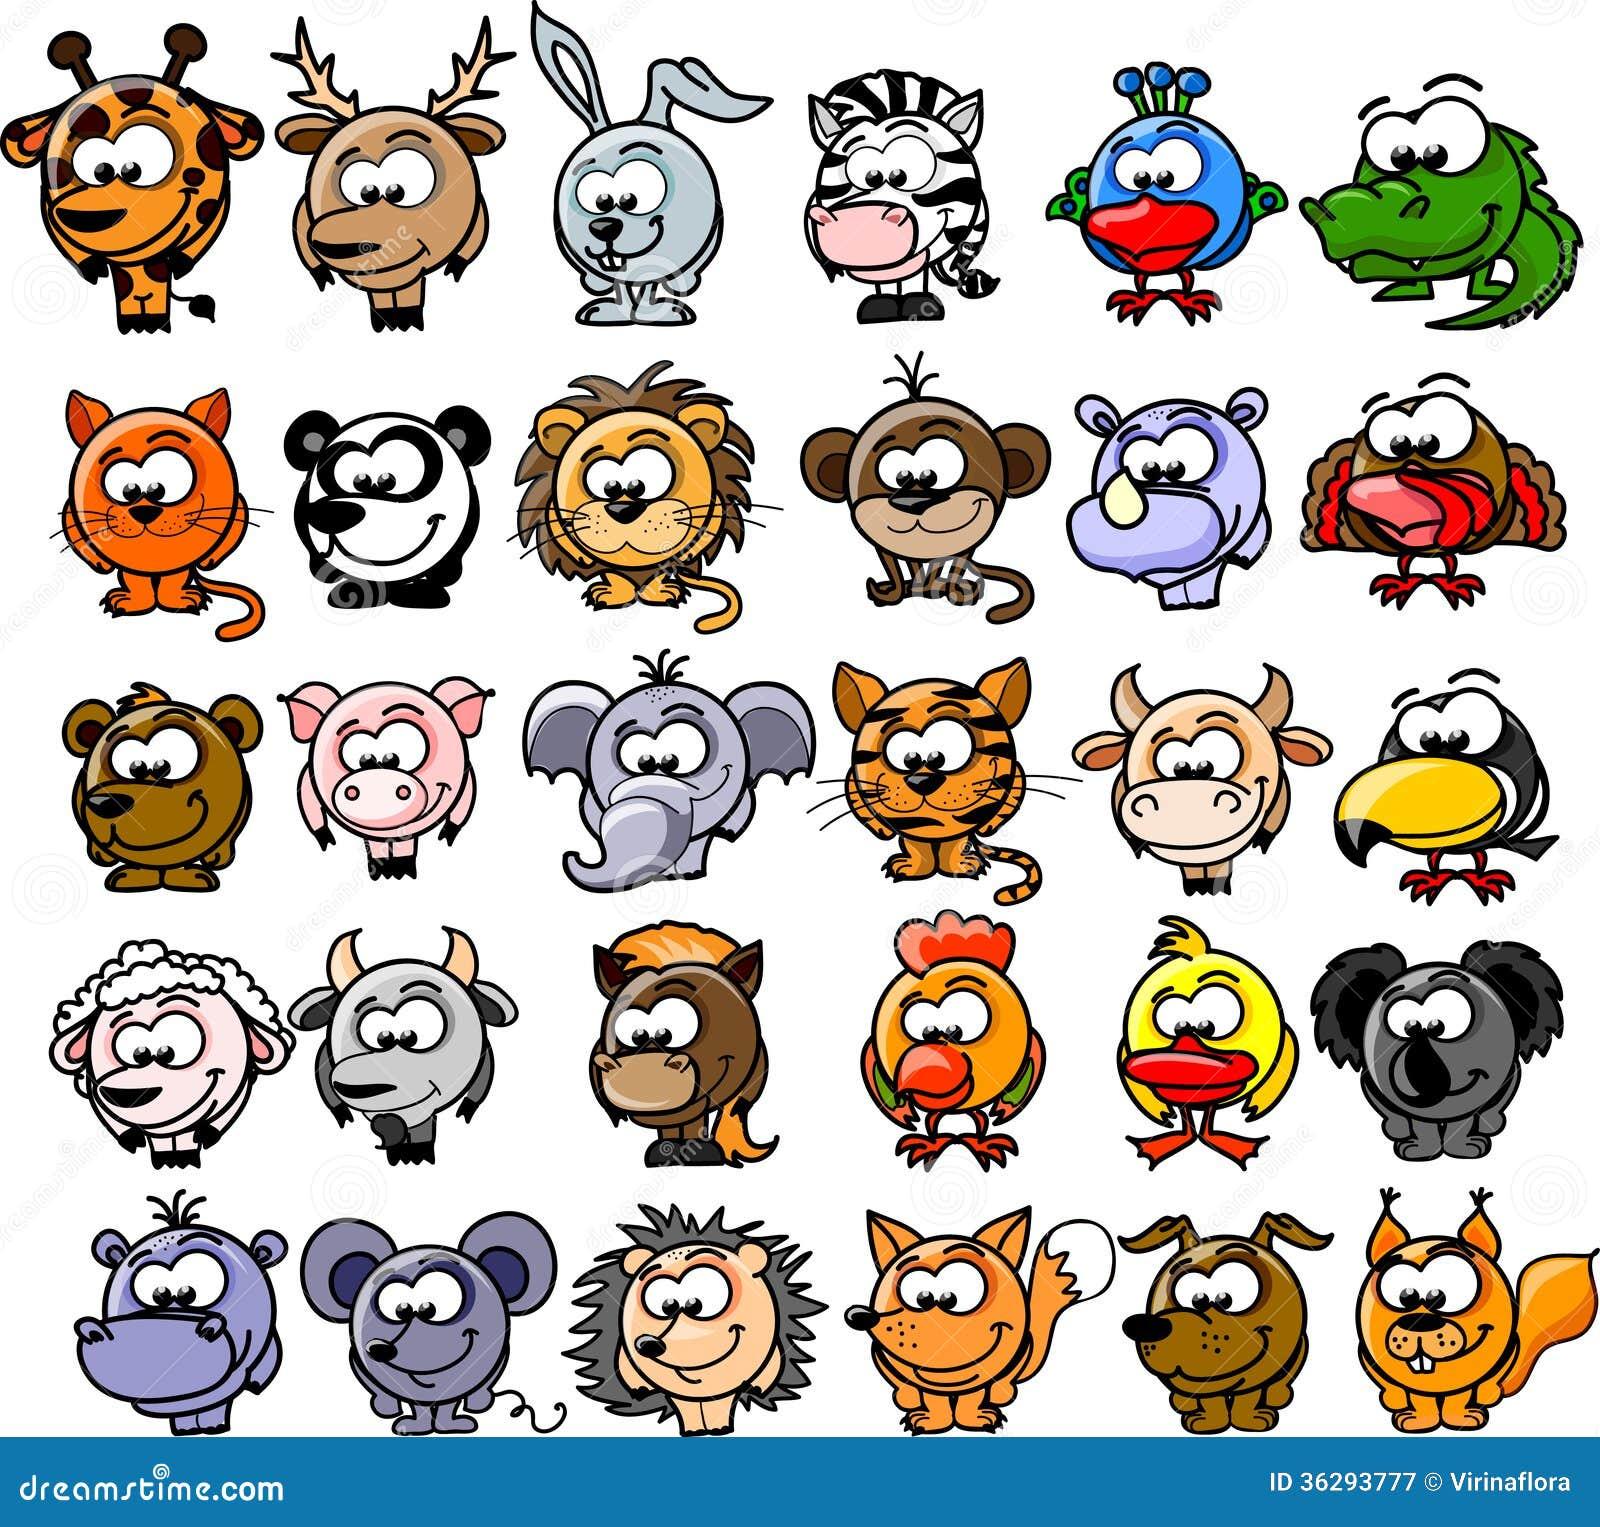 free clipart cartoon animals - photo #13